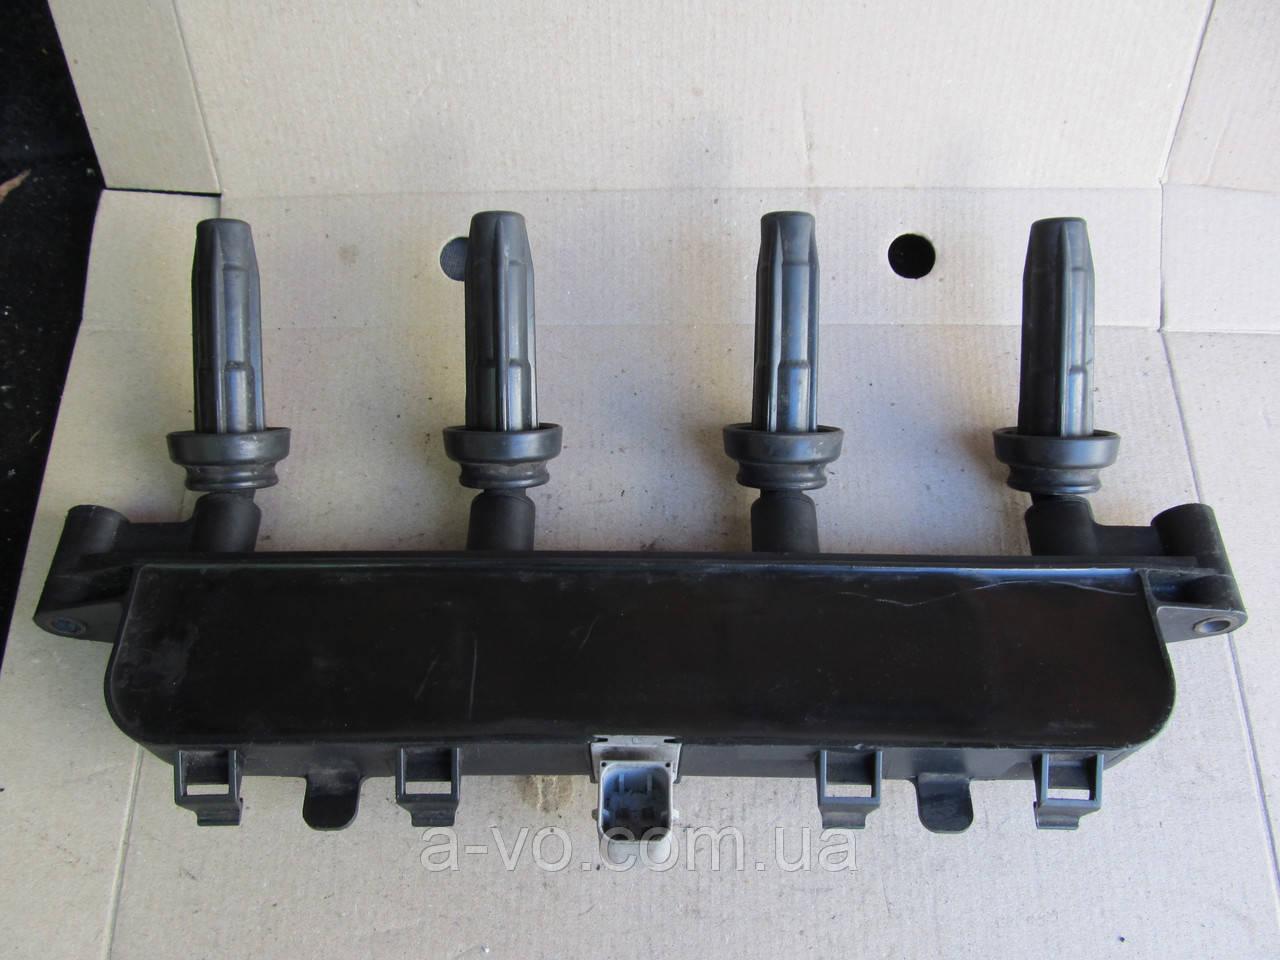 Катушка зажигания Citroen C2 C3 Saxo Picasso Berlingo Peugeot 206 306 Partner 1.1 1.4 1.6, 9635864980, 154302